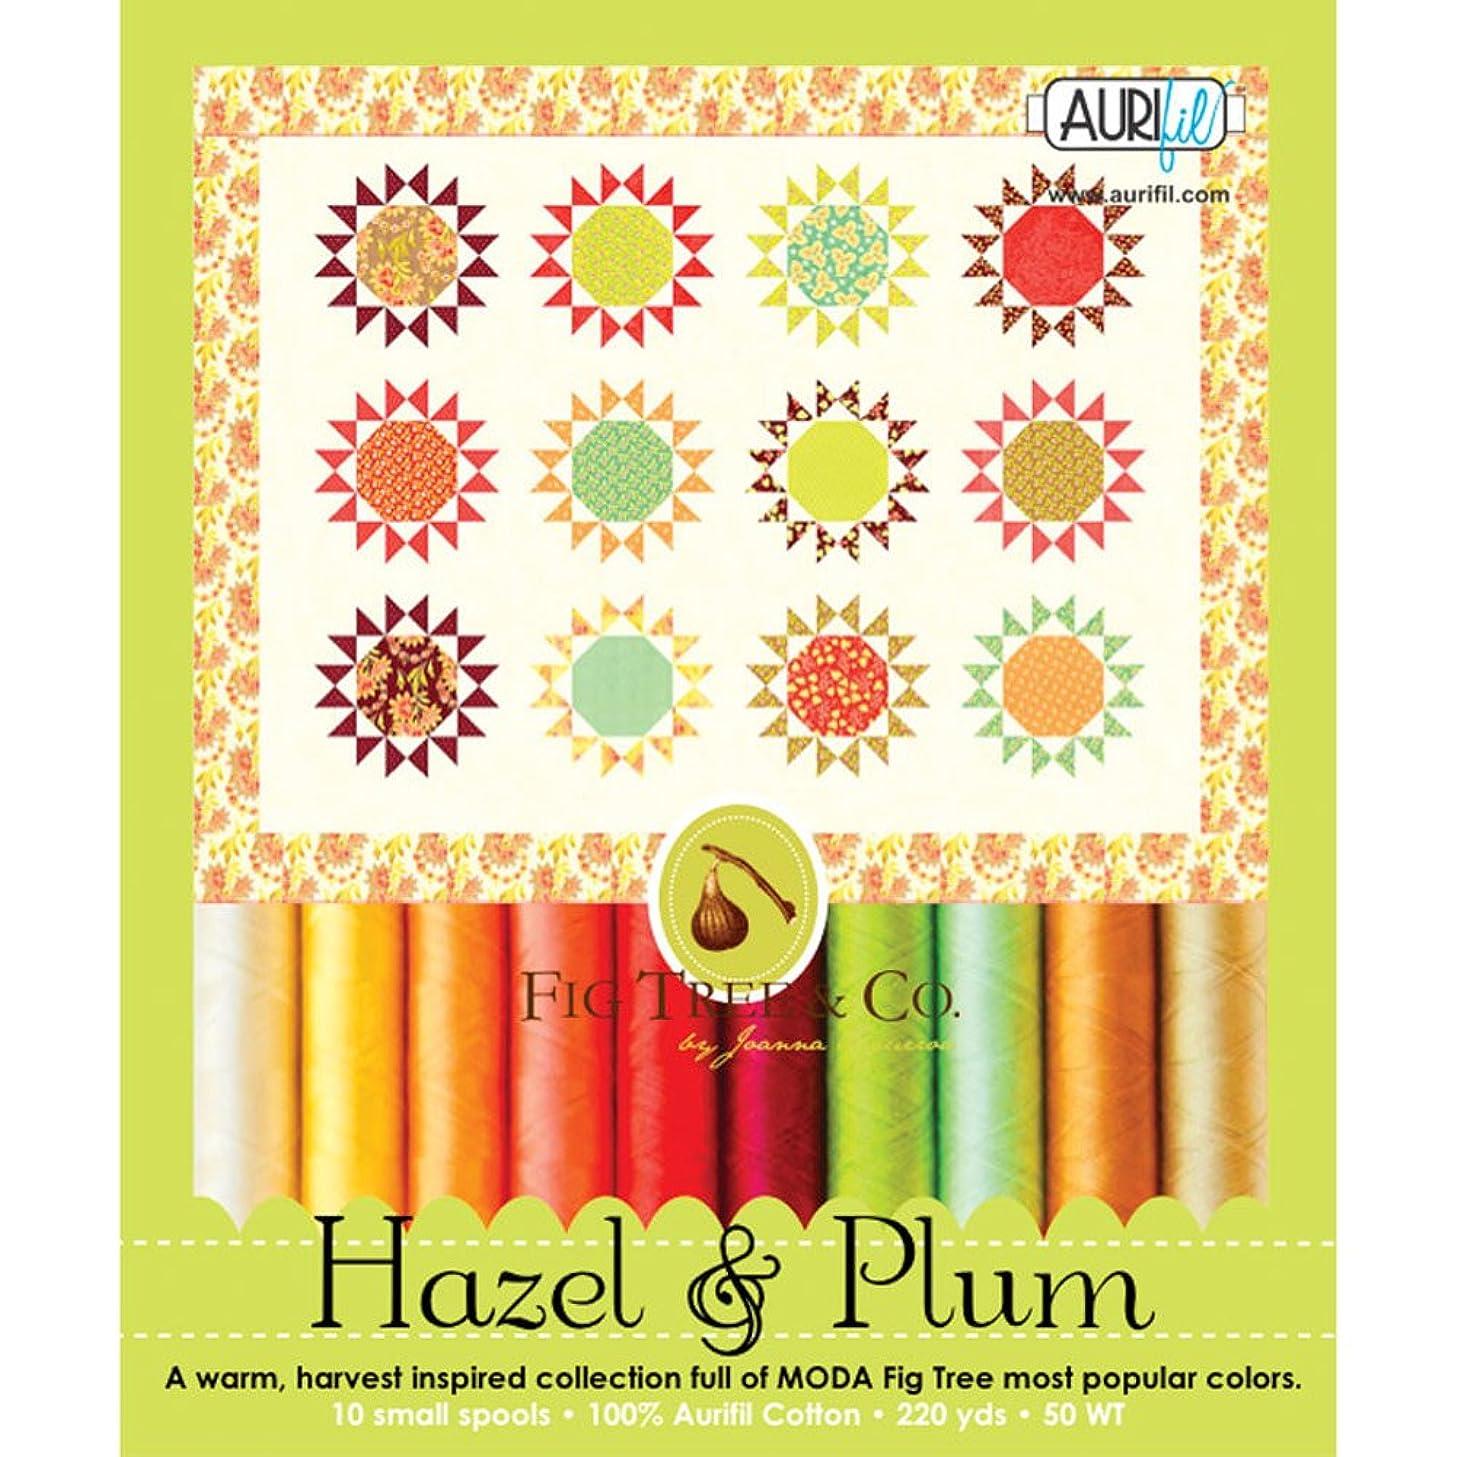 Fig Tree and Co Hazel & Plum Aurifil Thread Kit 10 Small Spools 50 Weight JF50HP10